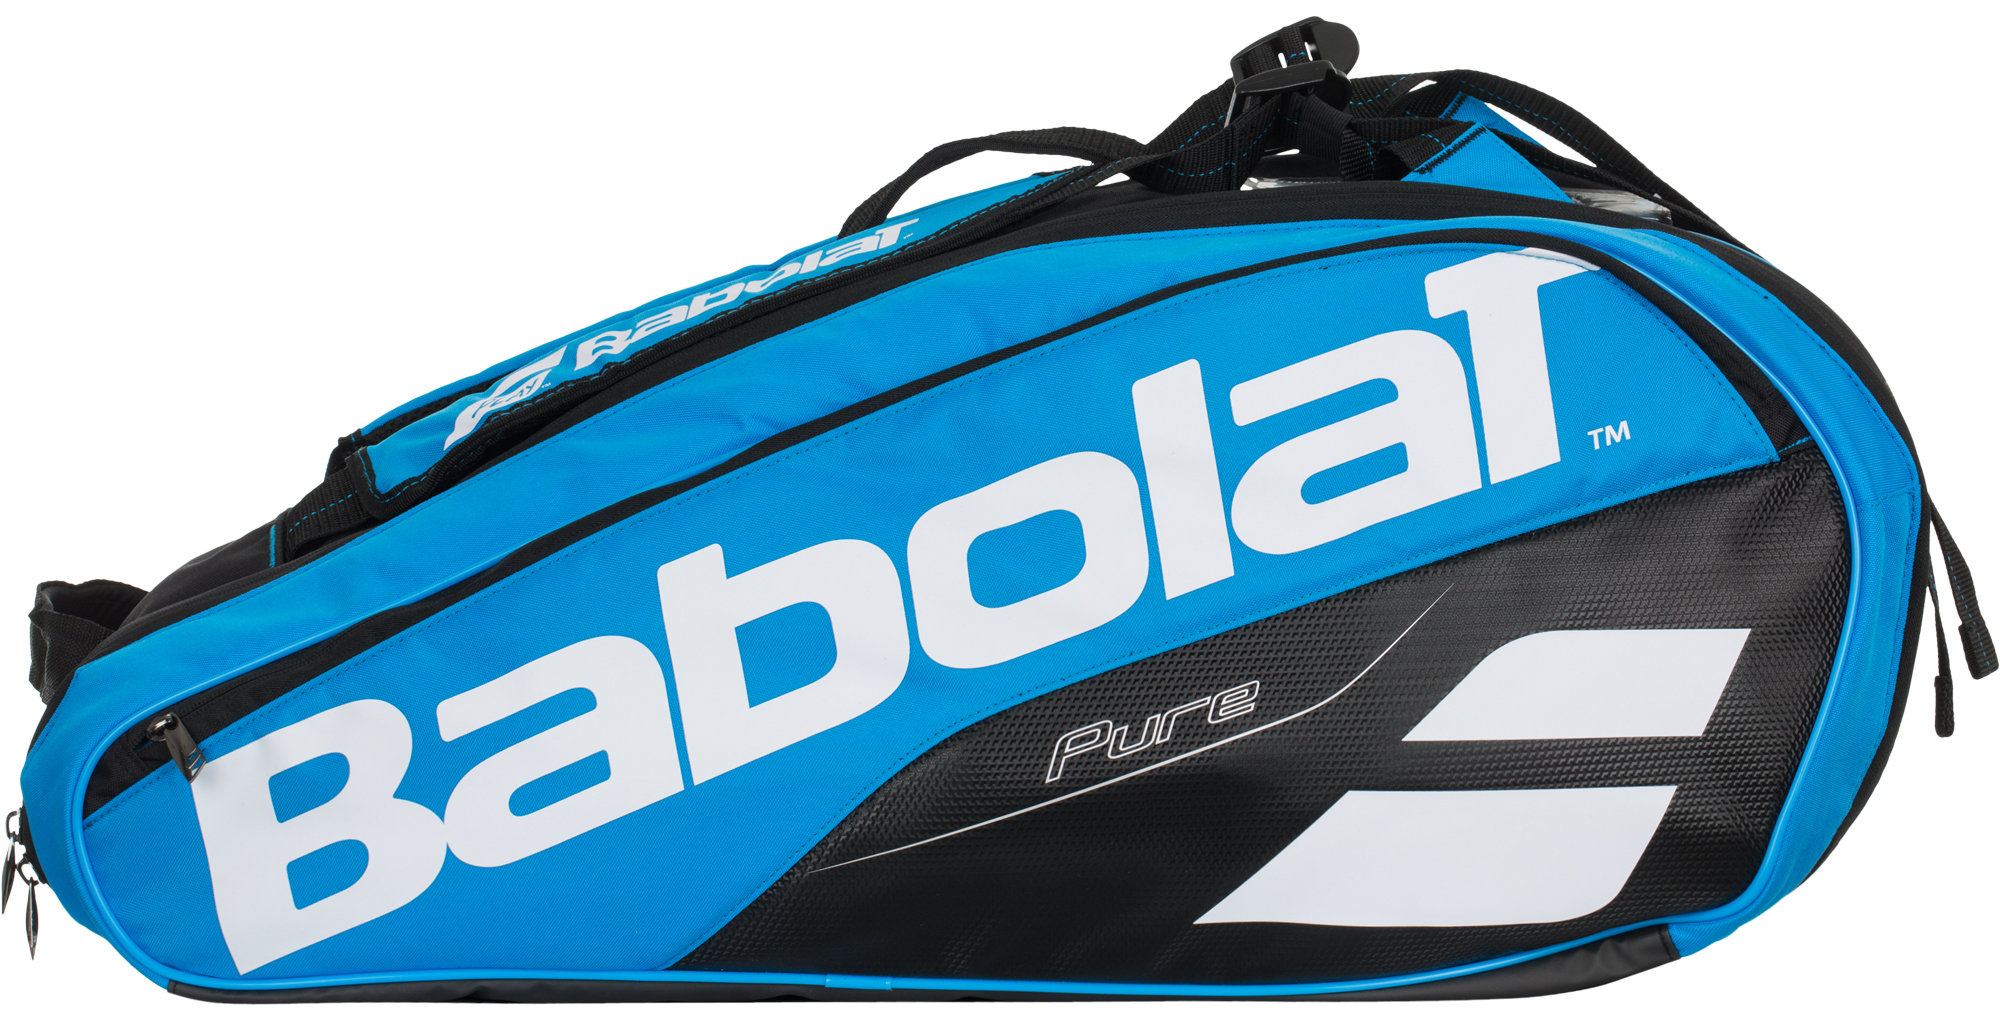 Babolat Сумка для 6 ракеток Babolat Pure babolat набор виброгасителей babolat custom damp